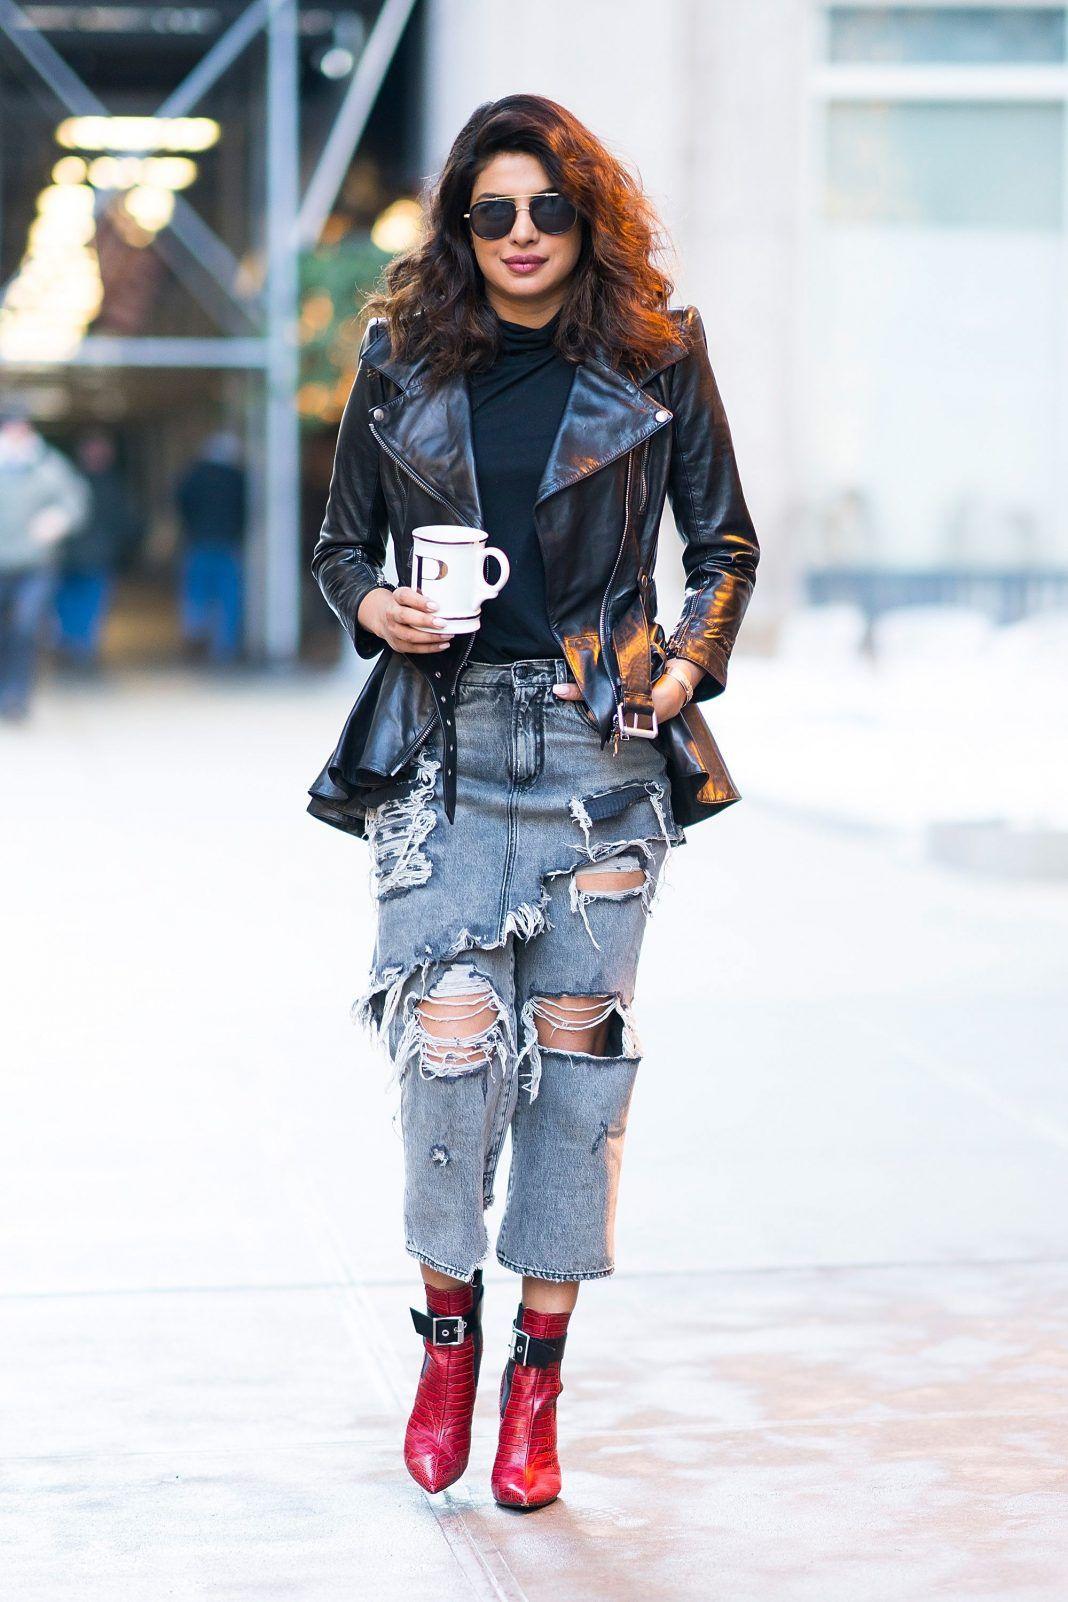 64ebc5b7d0ea Priyanka Chopra Ripped Jeans Street Style 2018  Priyanka chopra-style-fashion-street-moments-2018   Priyanka Chopra